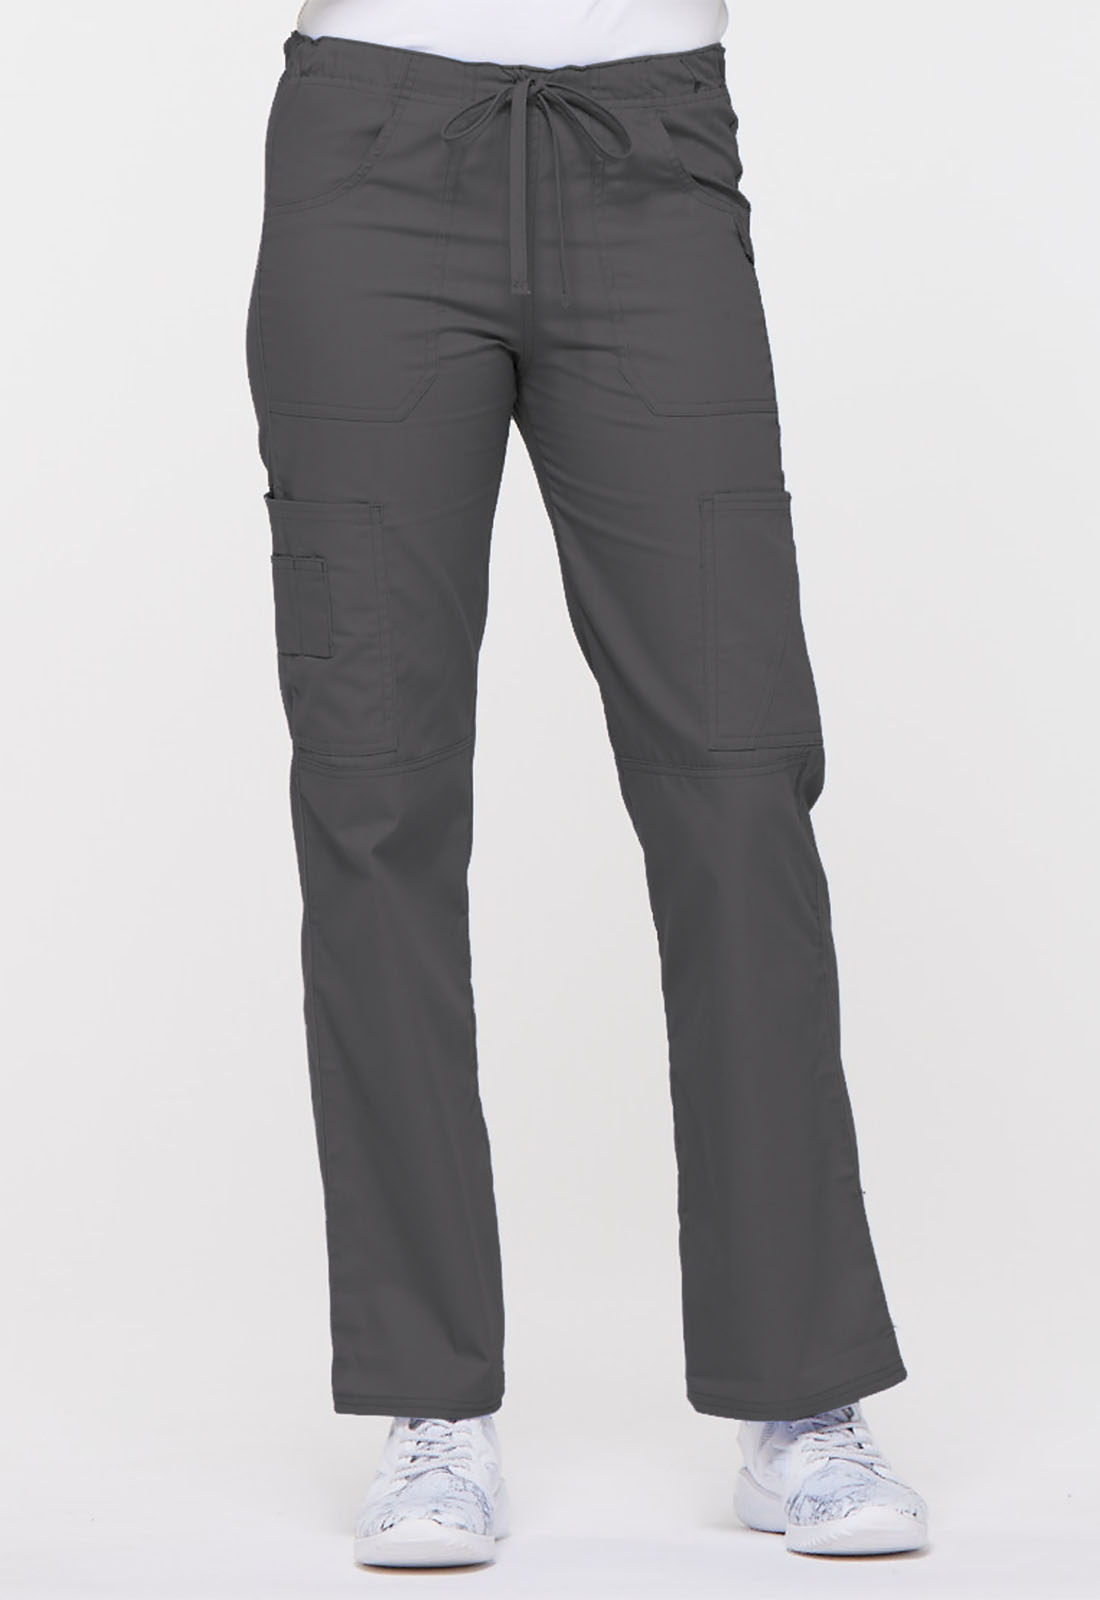 Men's slim work pants